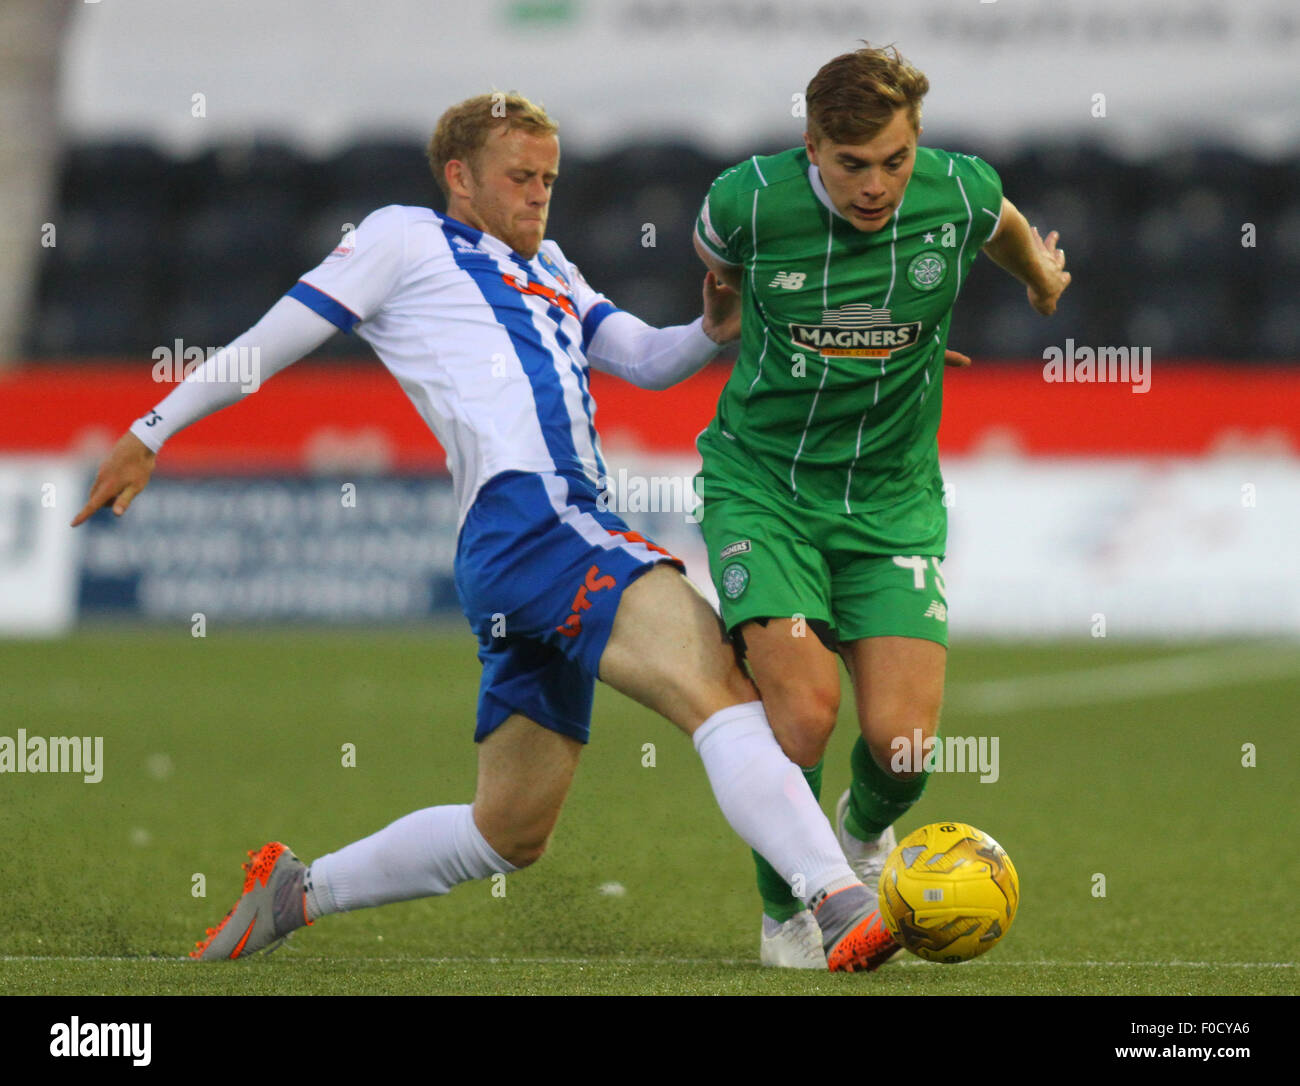 Kilmarnock, Scotland. 12th Aug, 2015. Scottish Premiership. Kilmarnock versus Celtic. James Forrest is tackled by - Stock Image